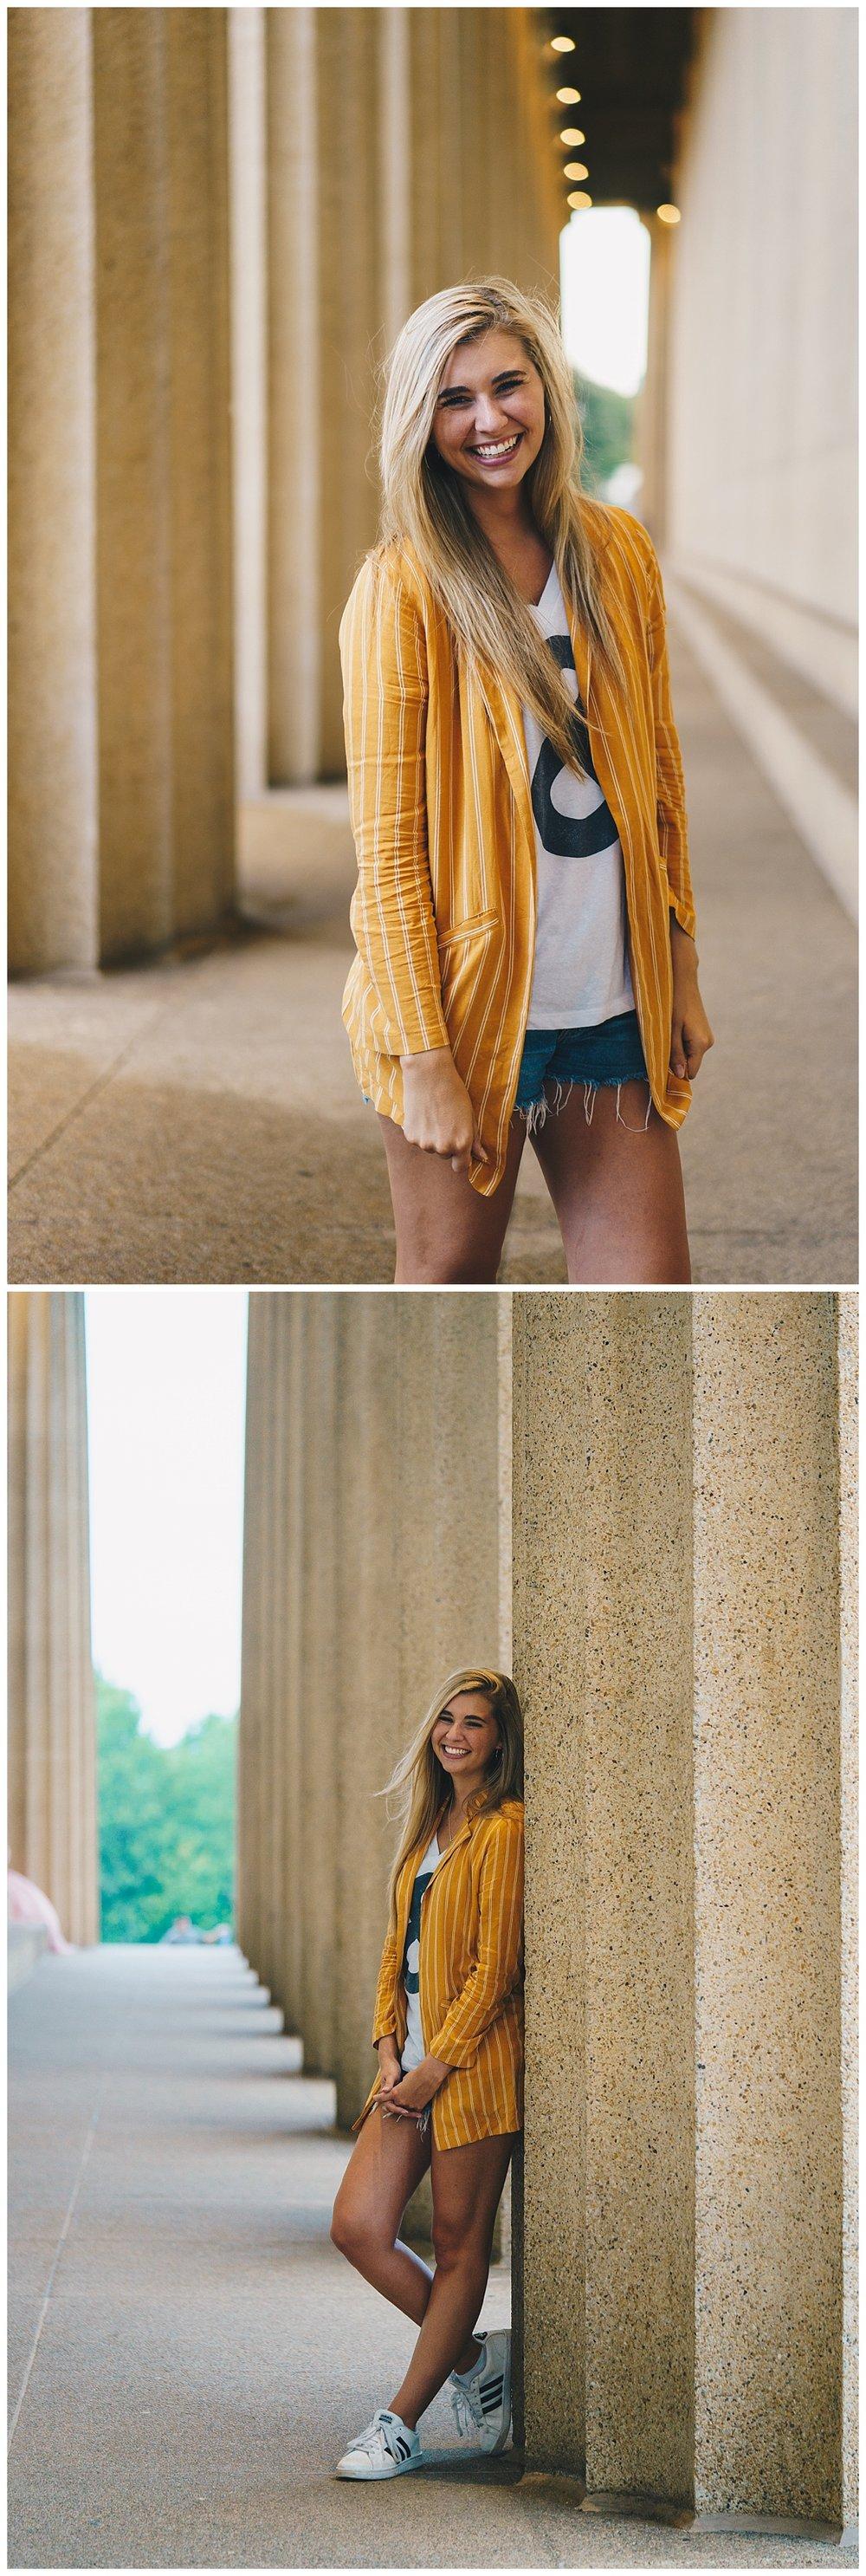 Nashville Photographer_Erin-5